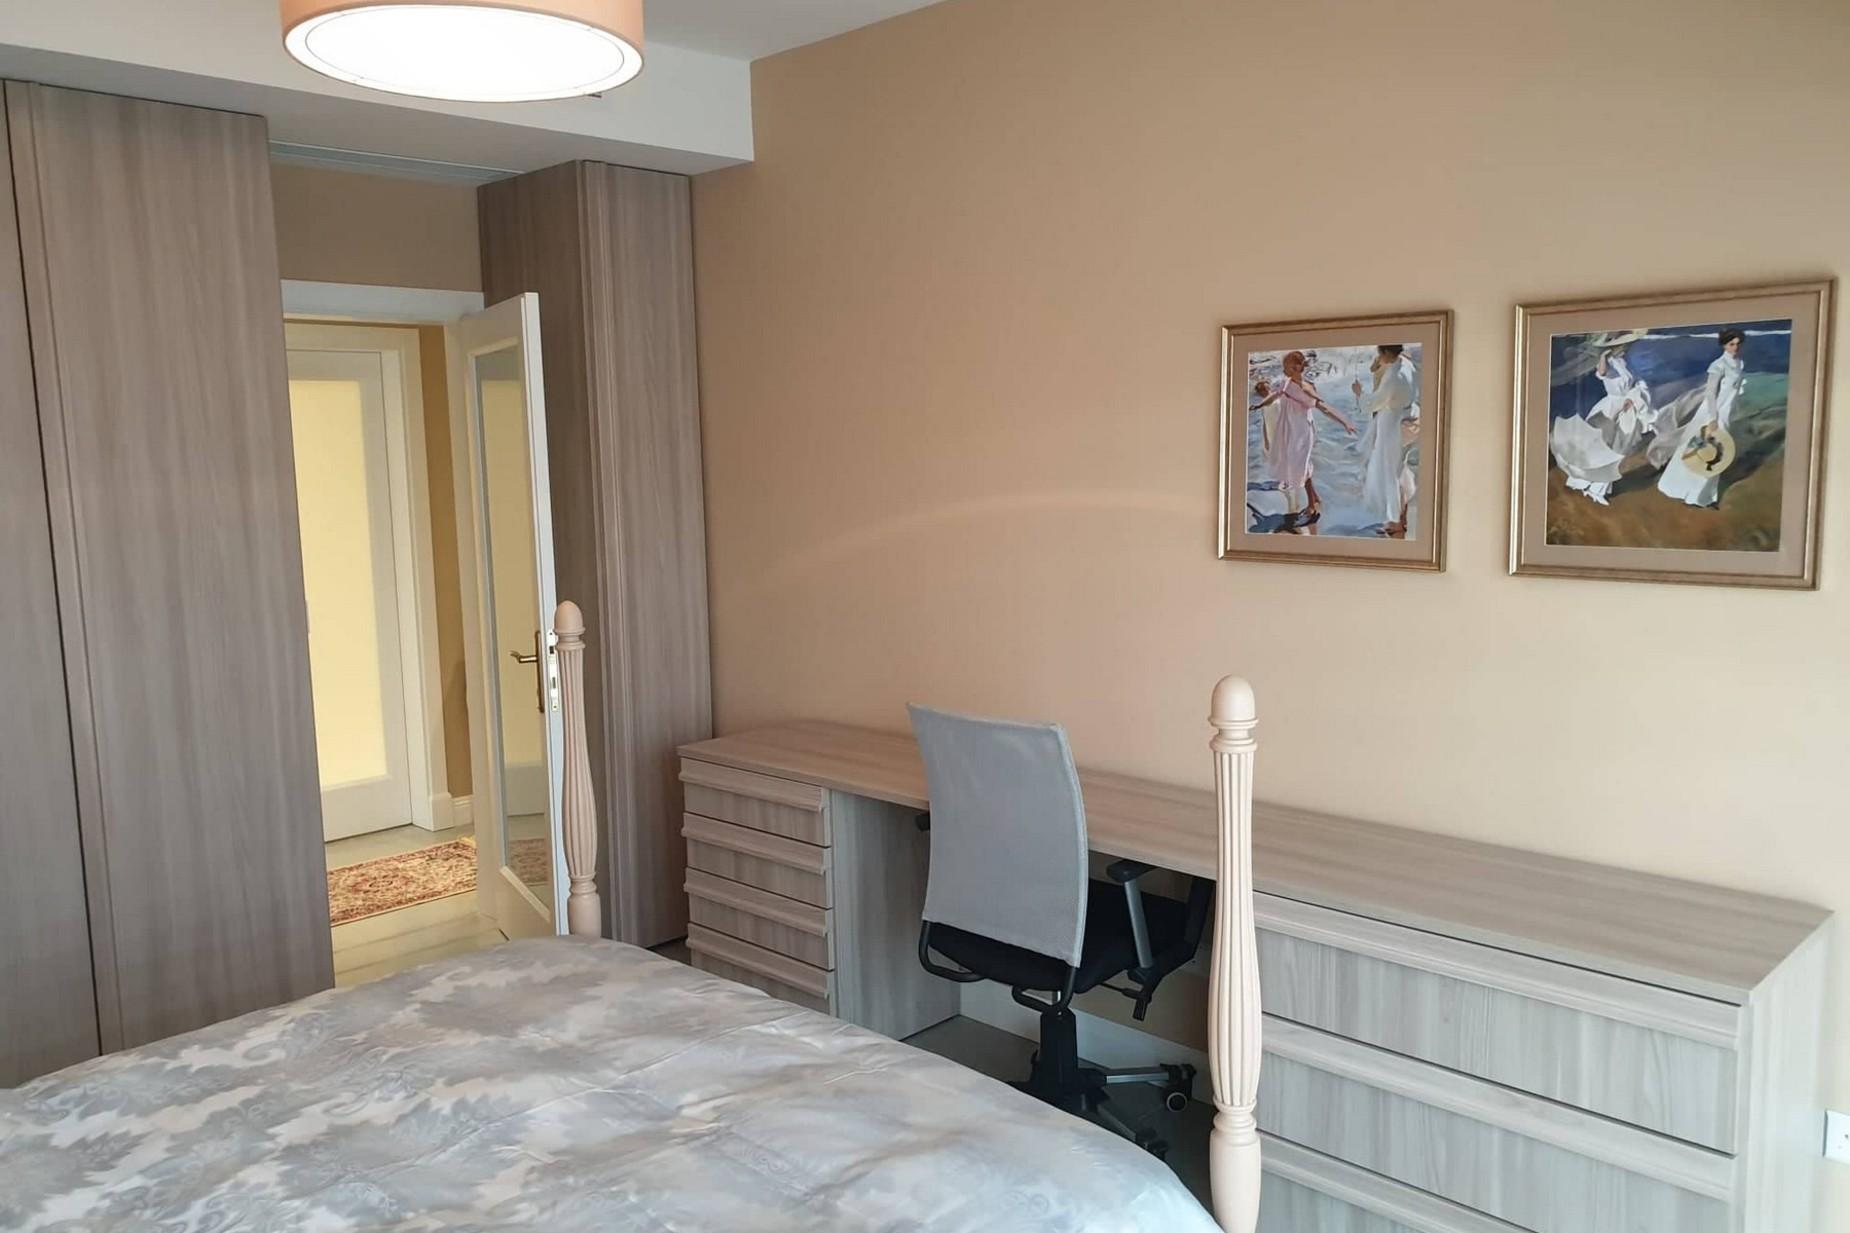 3 bed Apartment For Rent in Birkirkara, Birkirkara - thumb 16